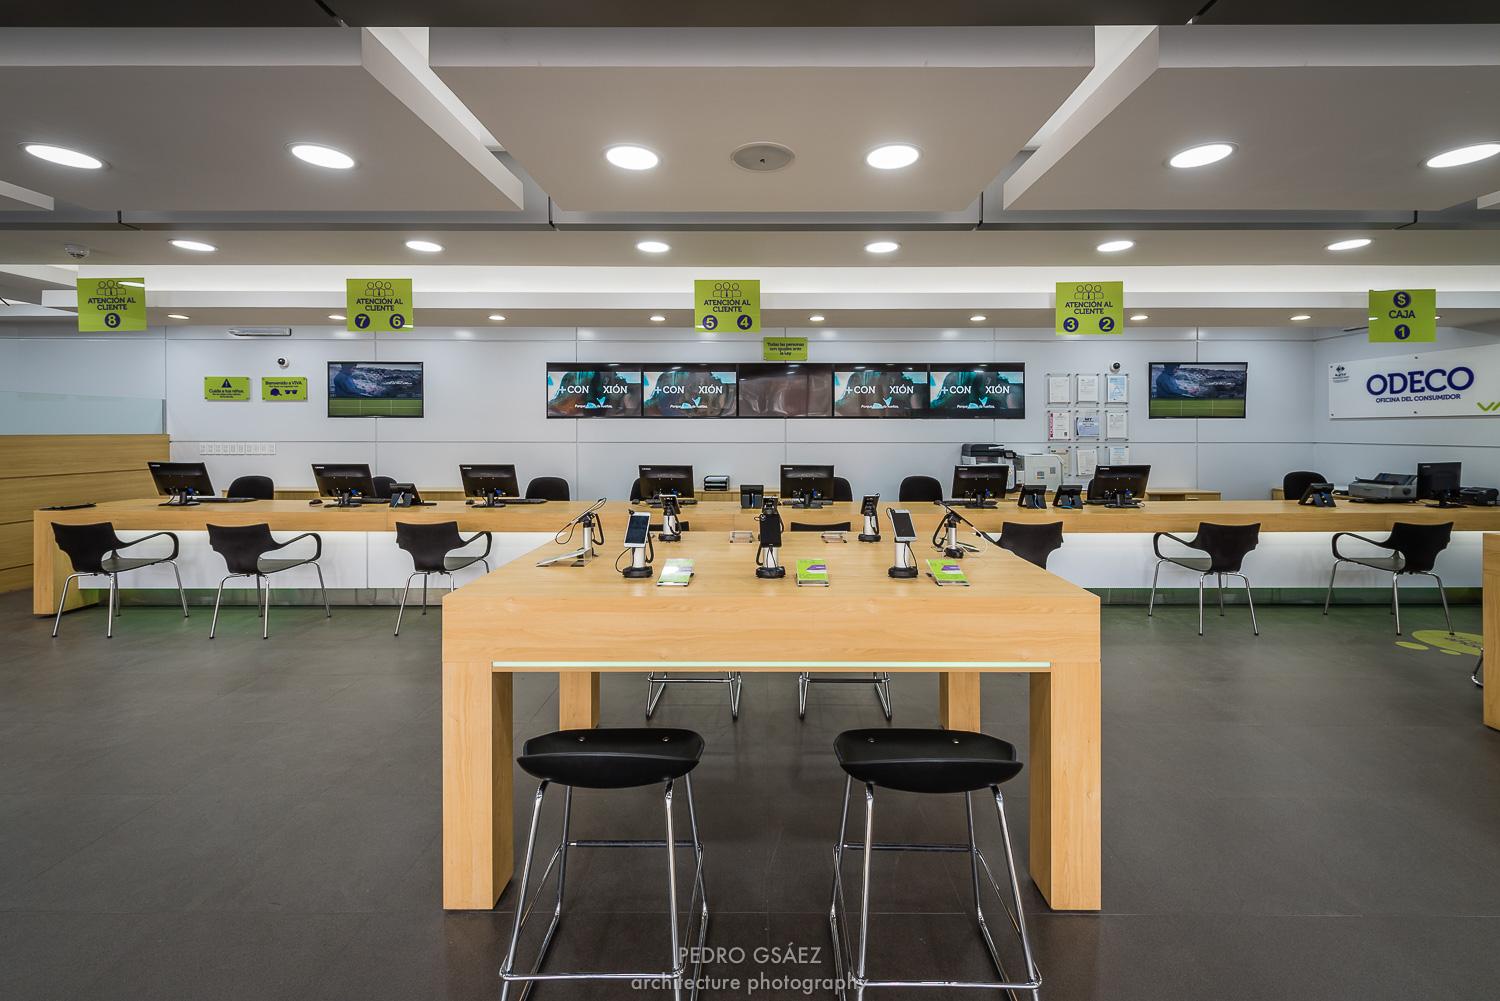 pedrogsaez-architecture-offices-viva-bolivia-13.jpg